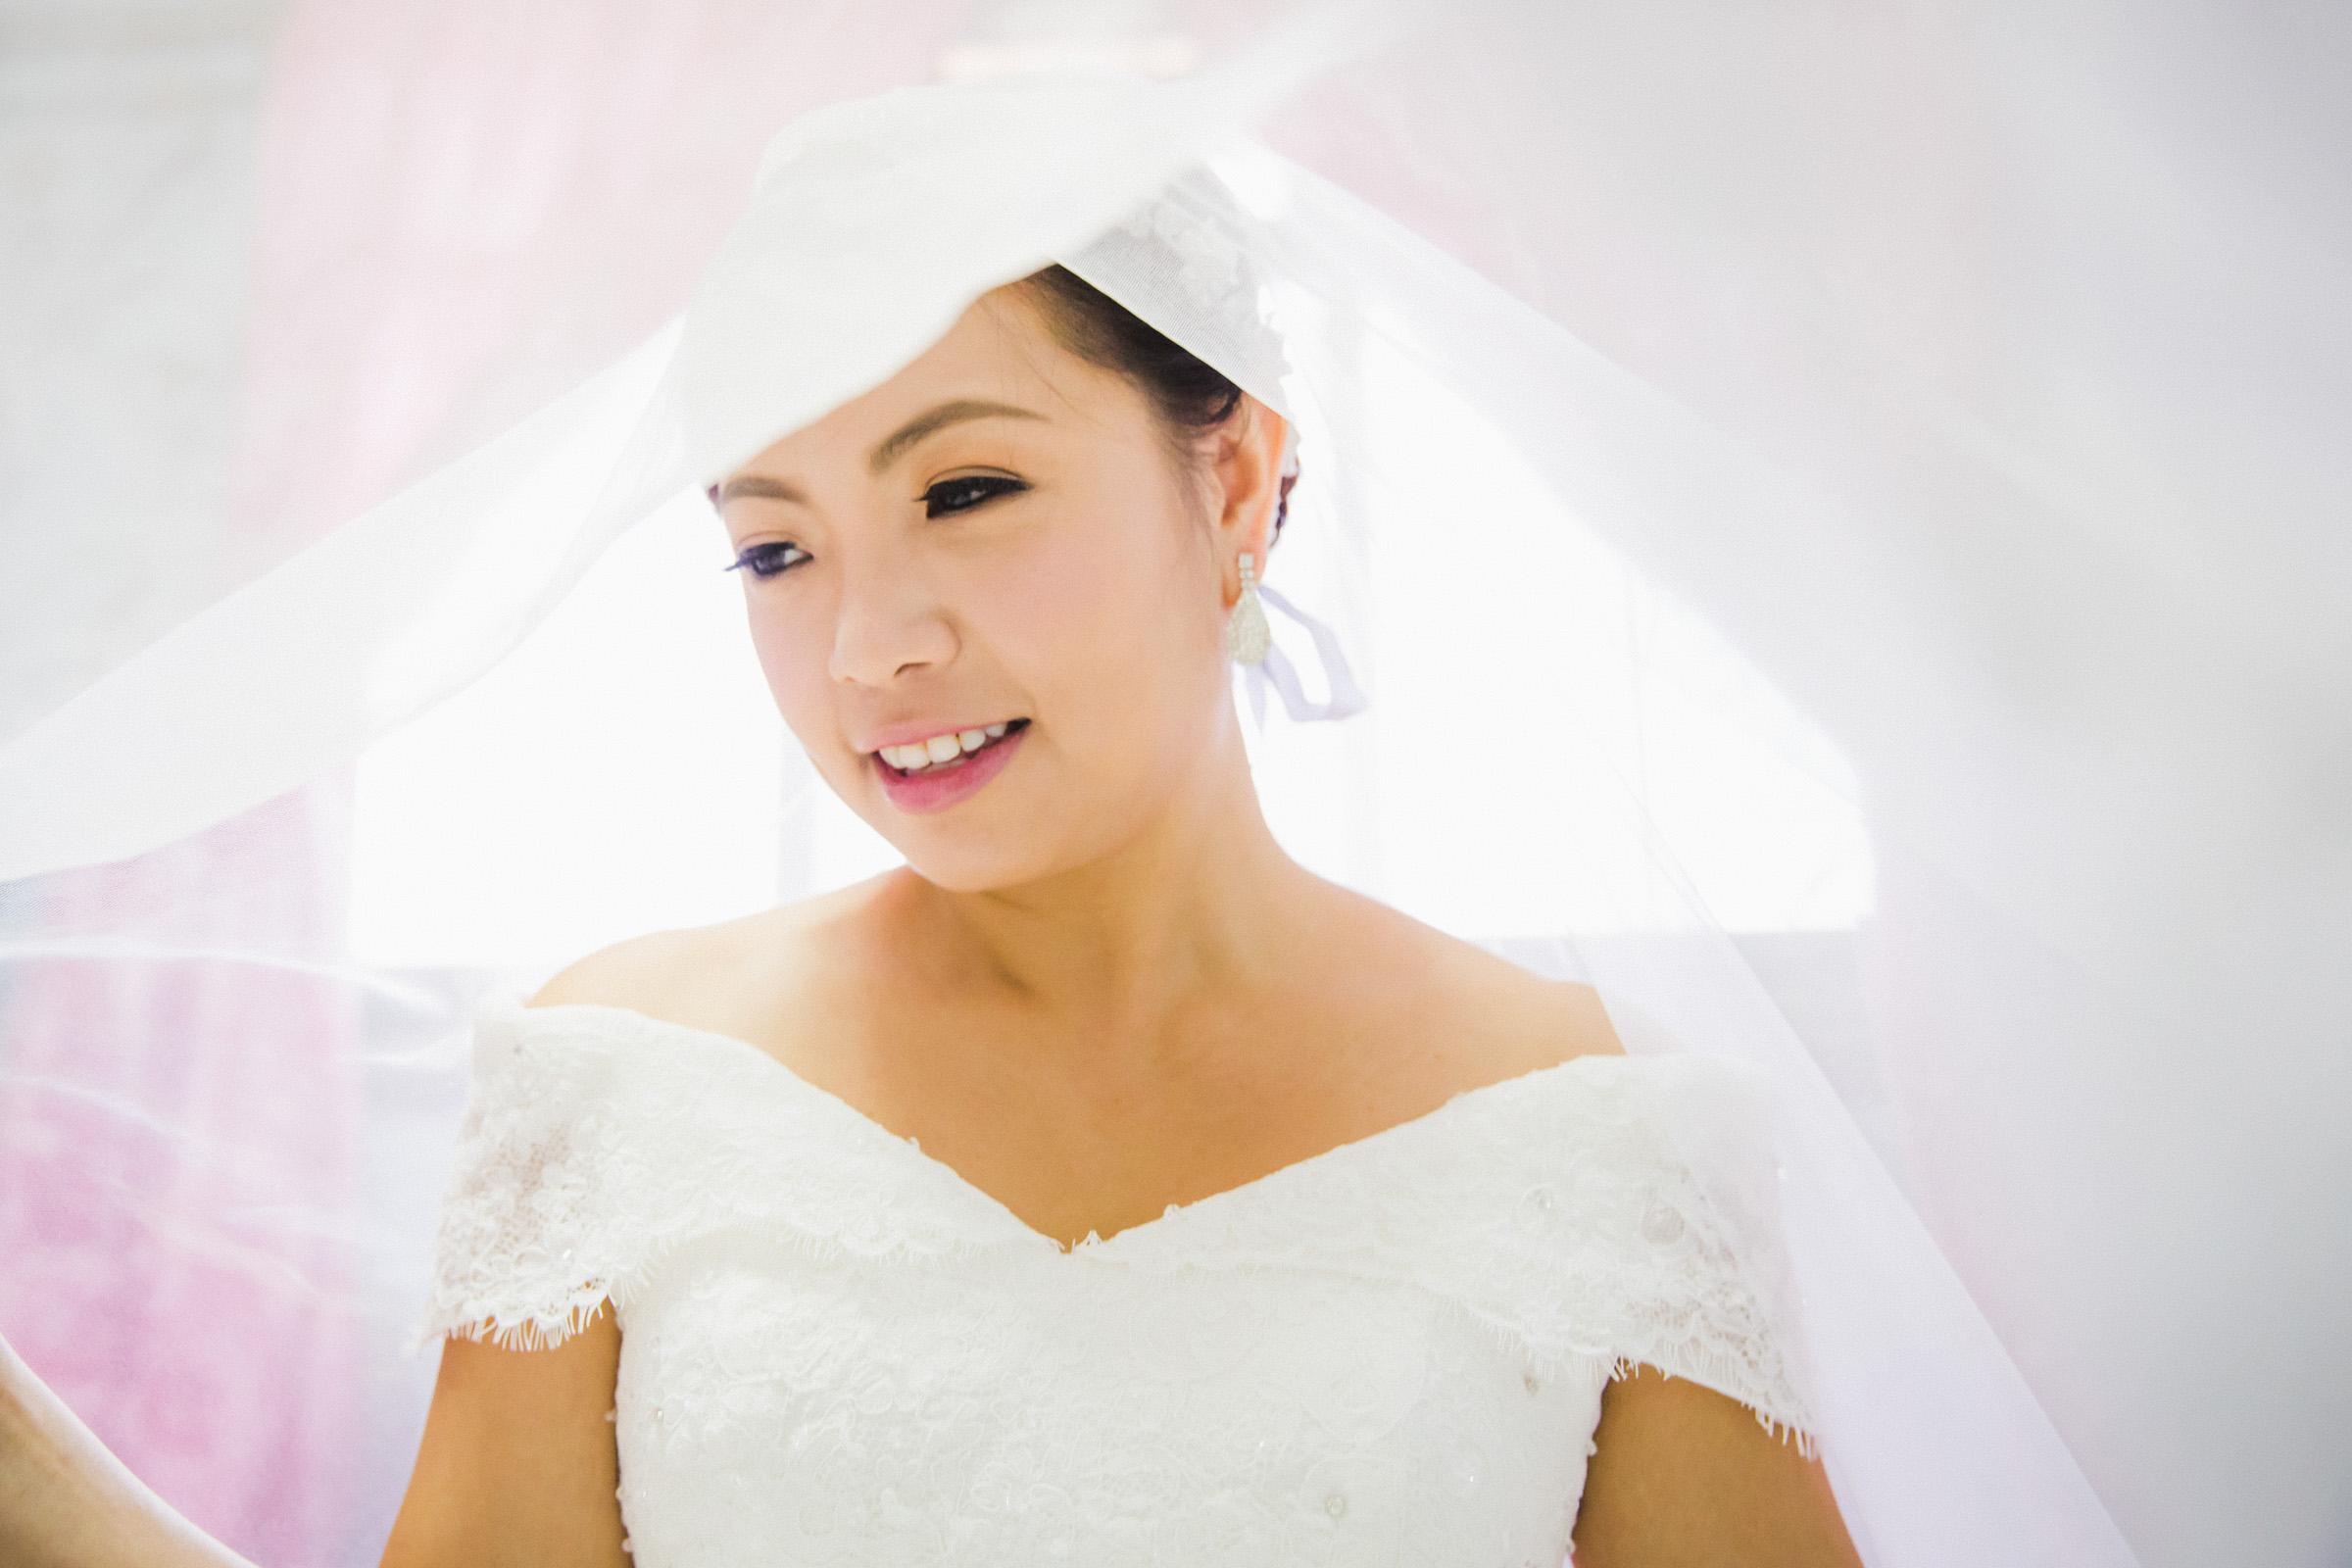 Steven_Jasmine_Wedding_Walldrobe Photography_Wedding shoots_Actual day wedding_Photographer (9)